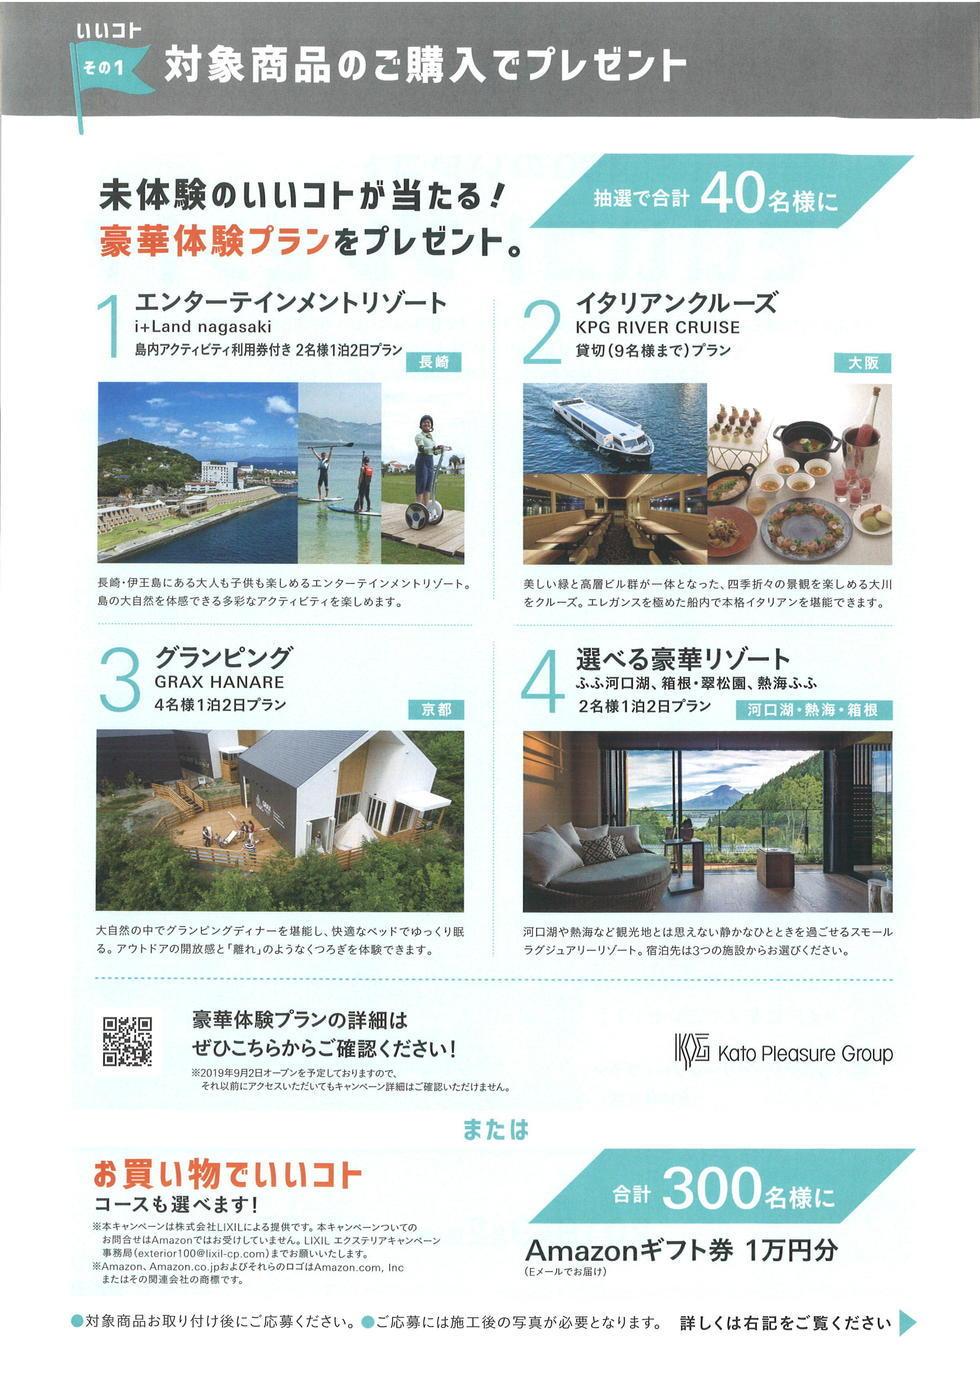 https://lixil-reformshop.jp/shop/SP00000598/assets_c/2019/09/64a913b699510f9b96917c57b90d2ceb11a3ebde-thumb-autox1386-305779.jpg